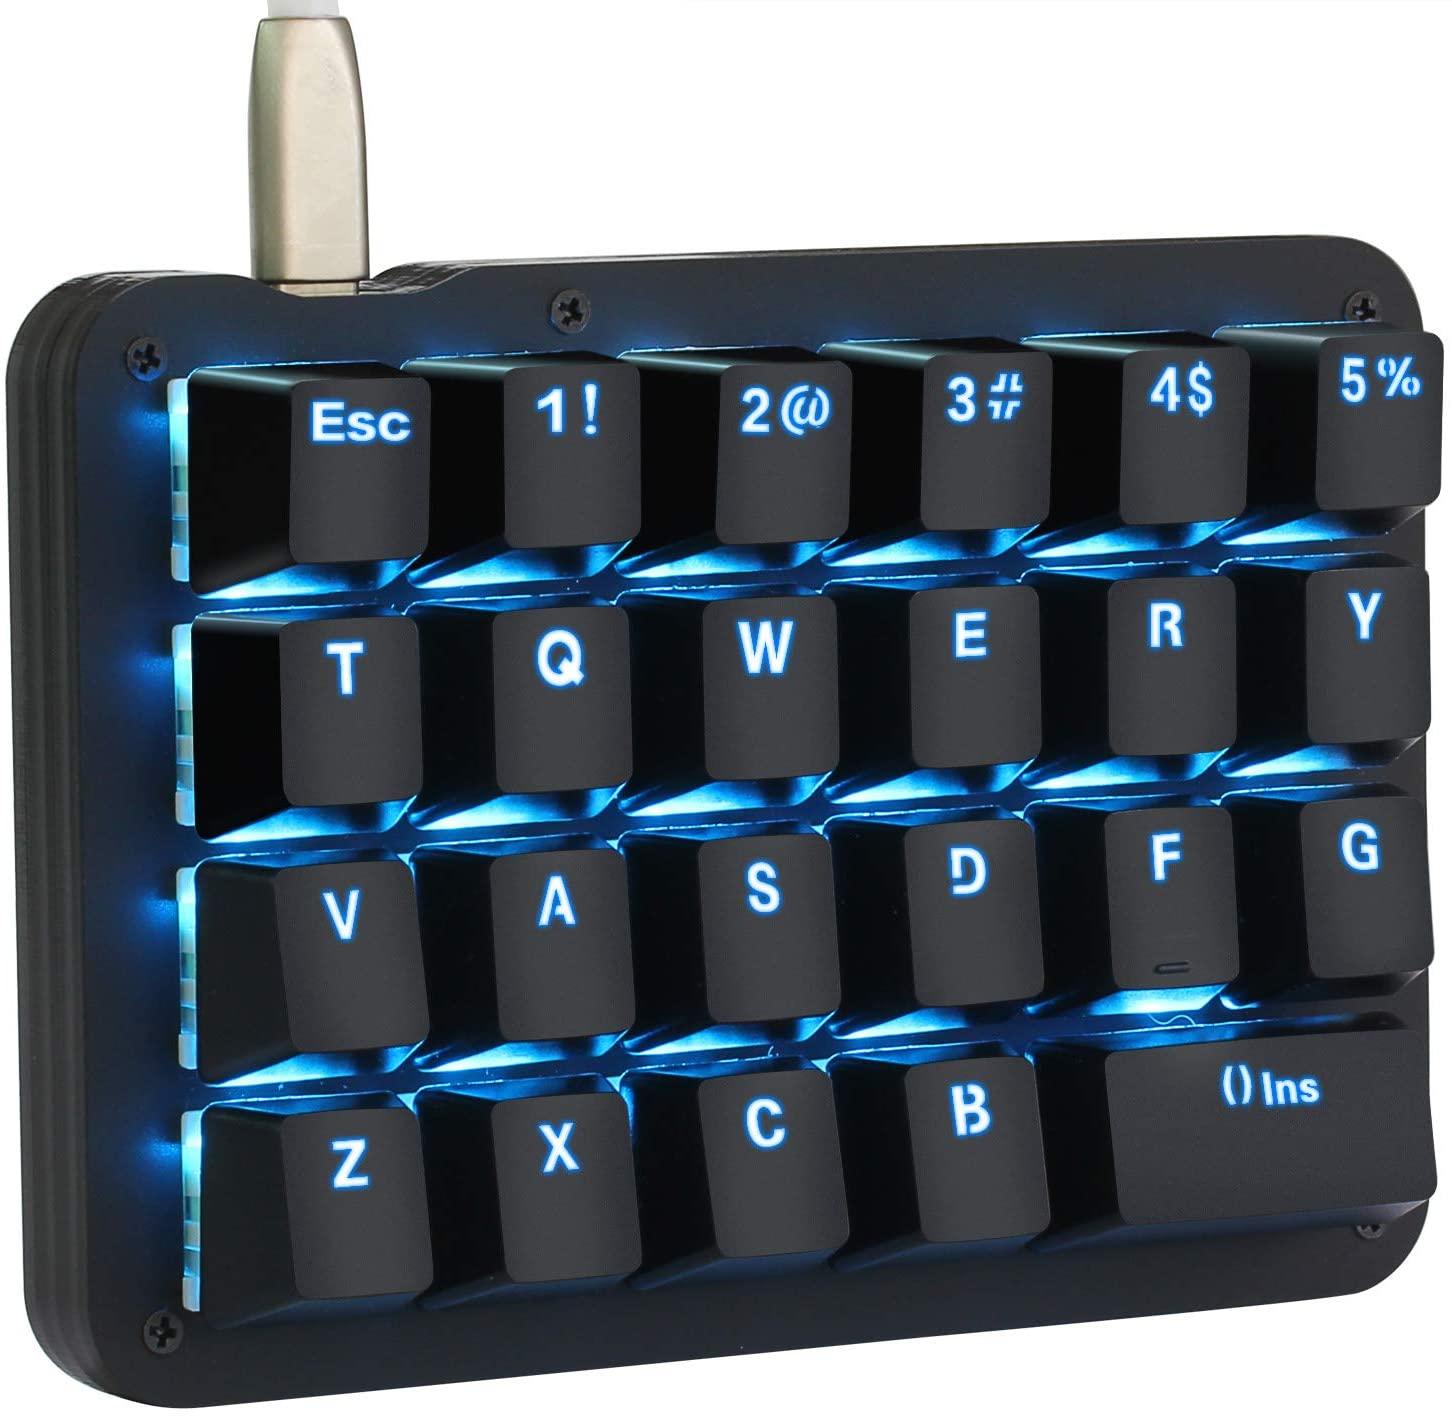 Koolertron one-handed keyboard